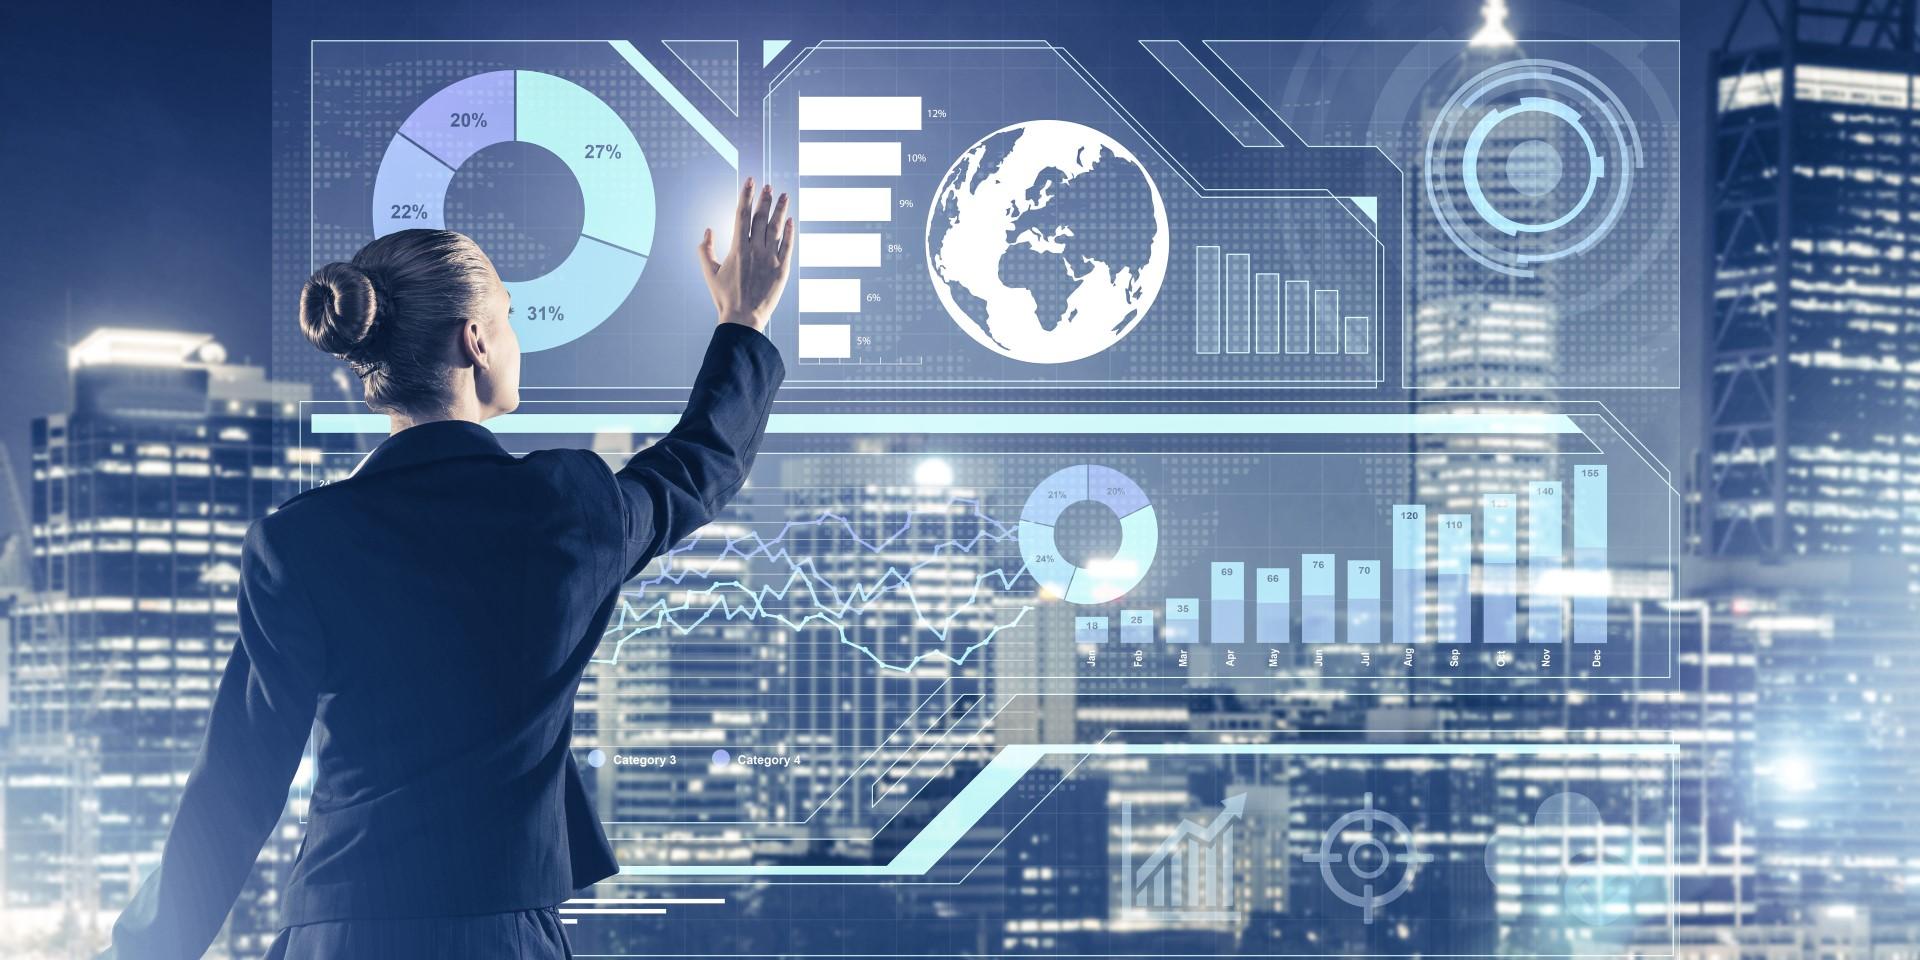 Organizations struggling to capitalize on benefits of big data